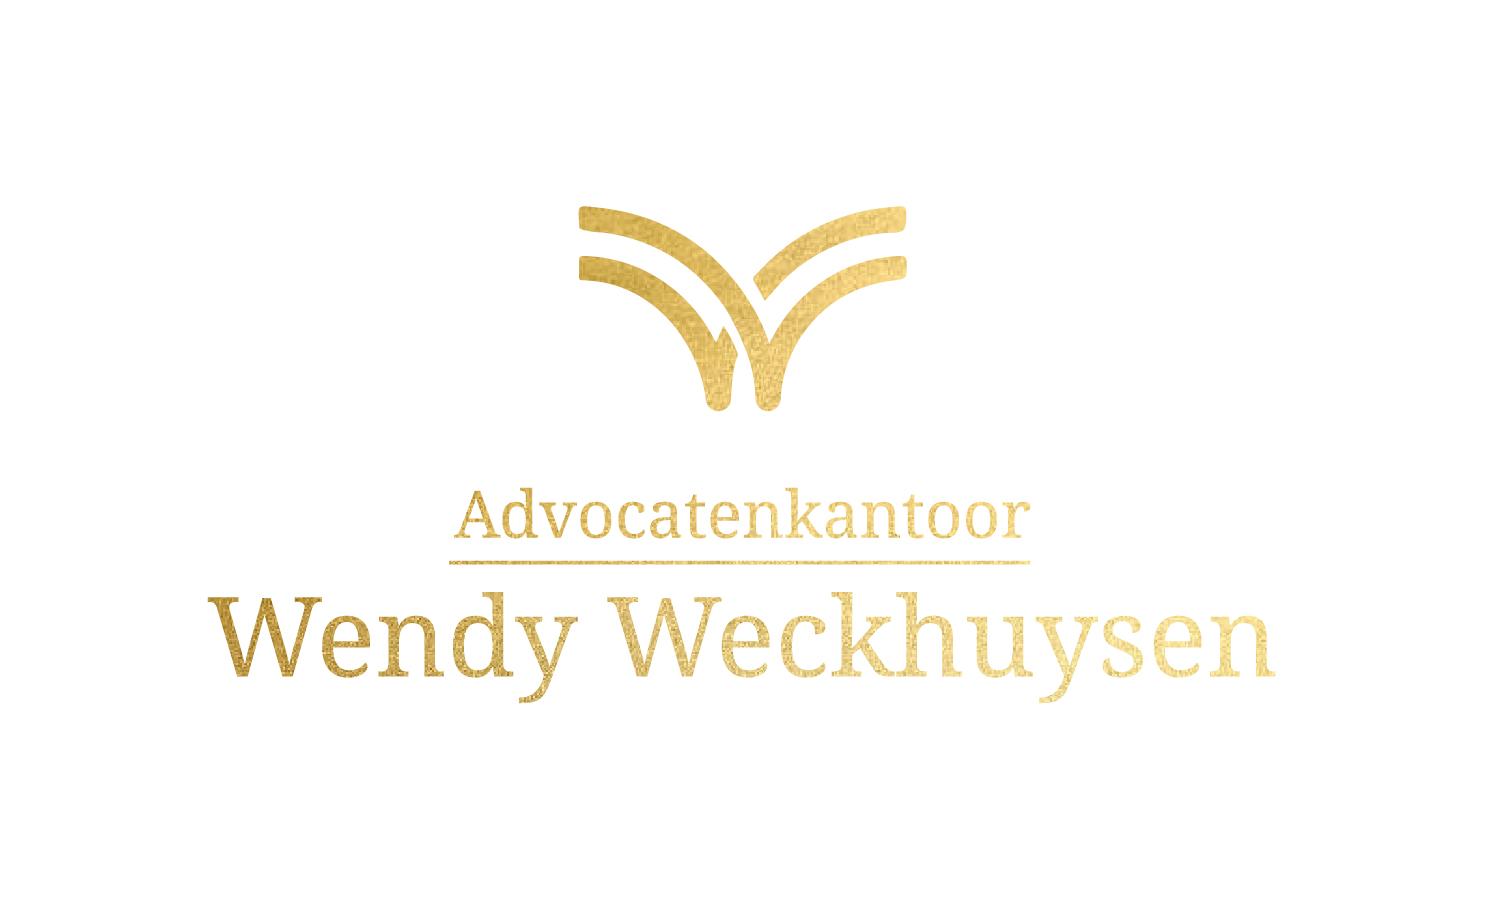 Advocatenkantoor Wendy Weckhuysenn